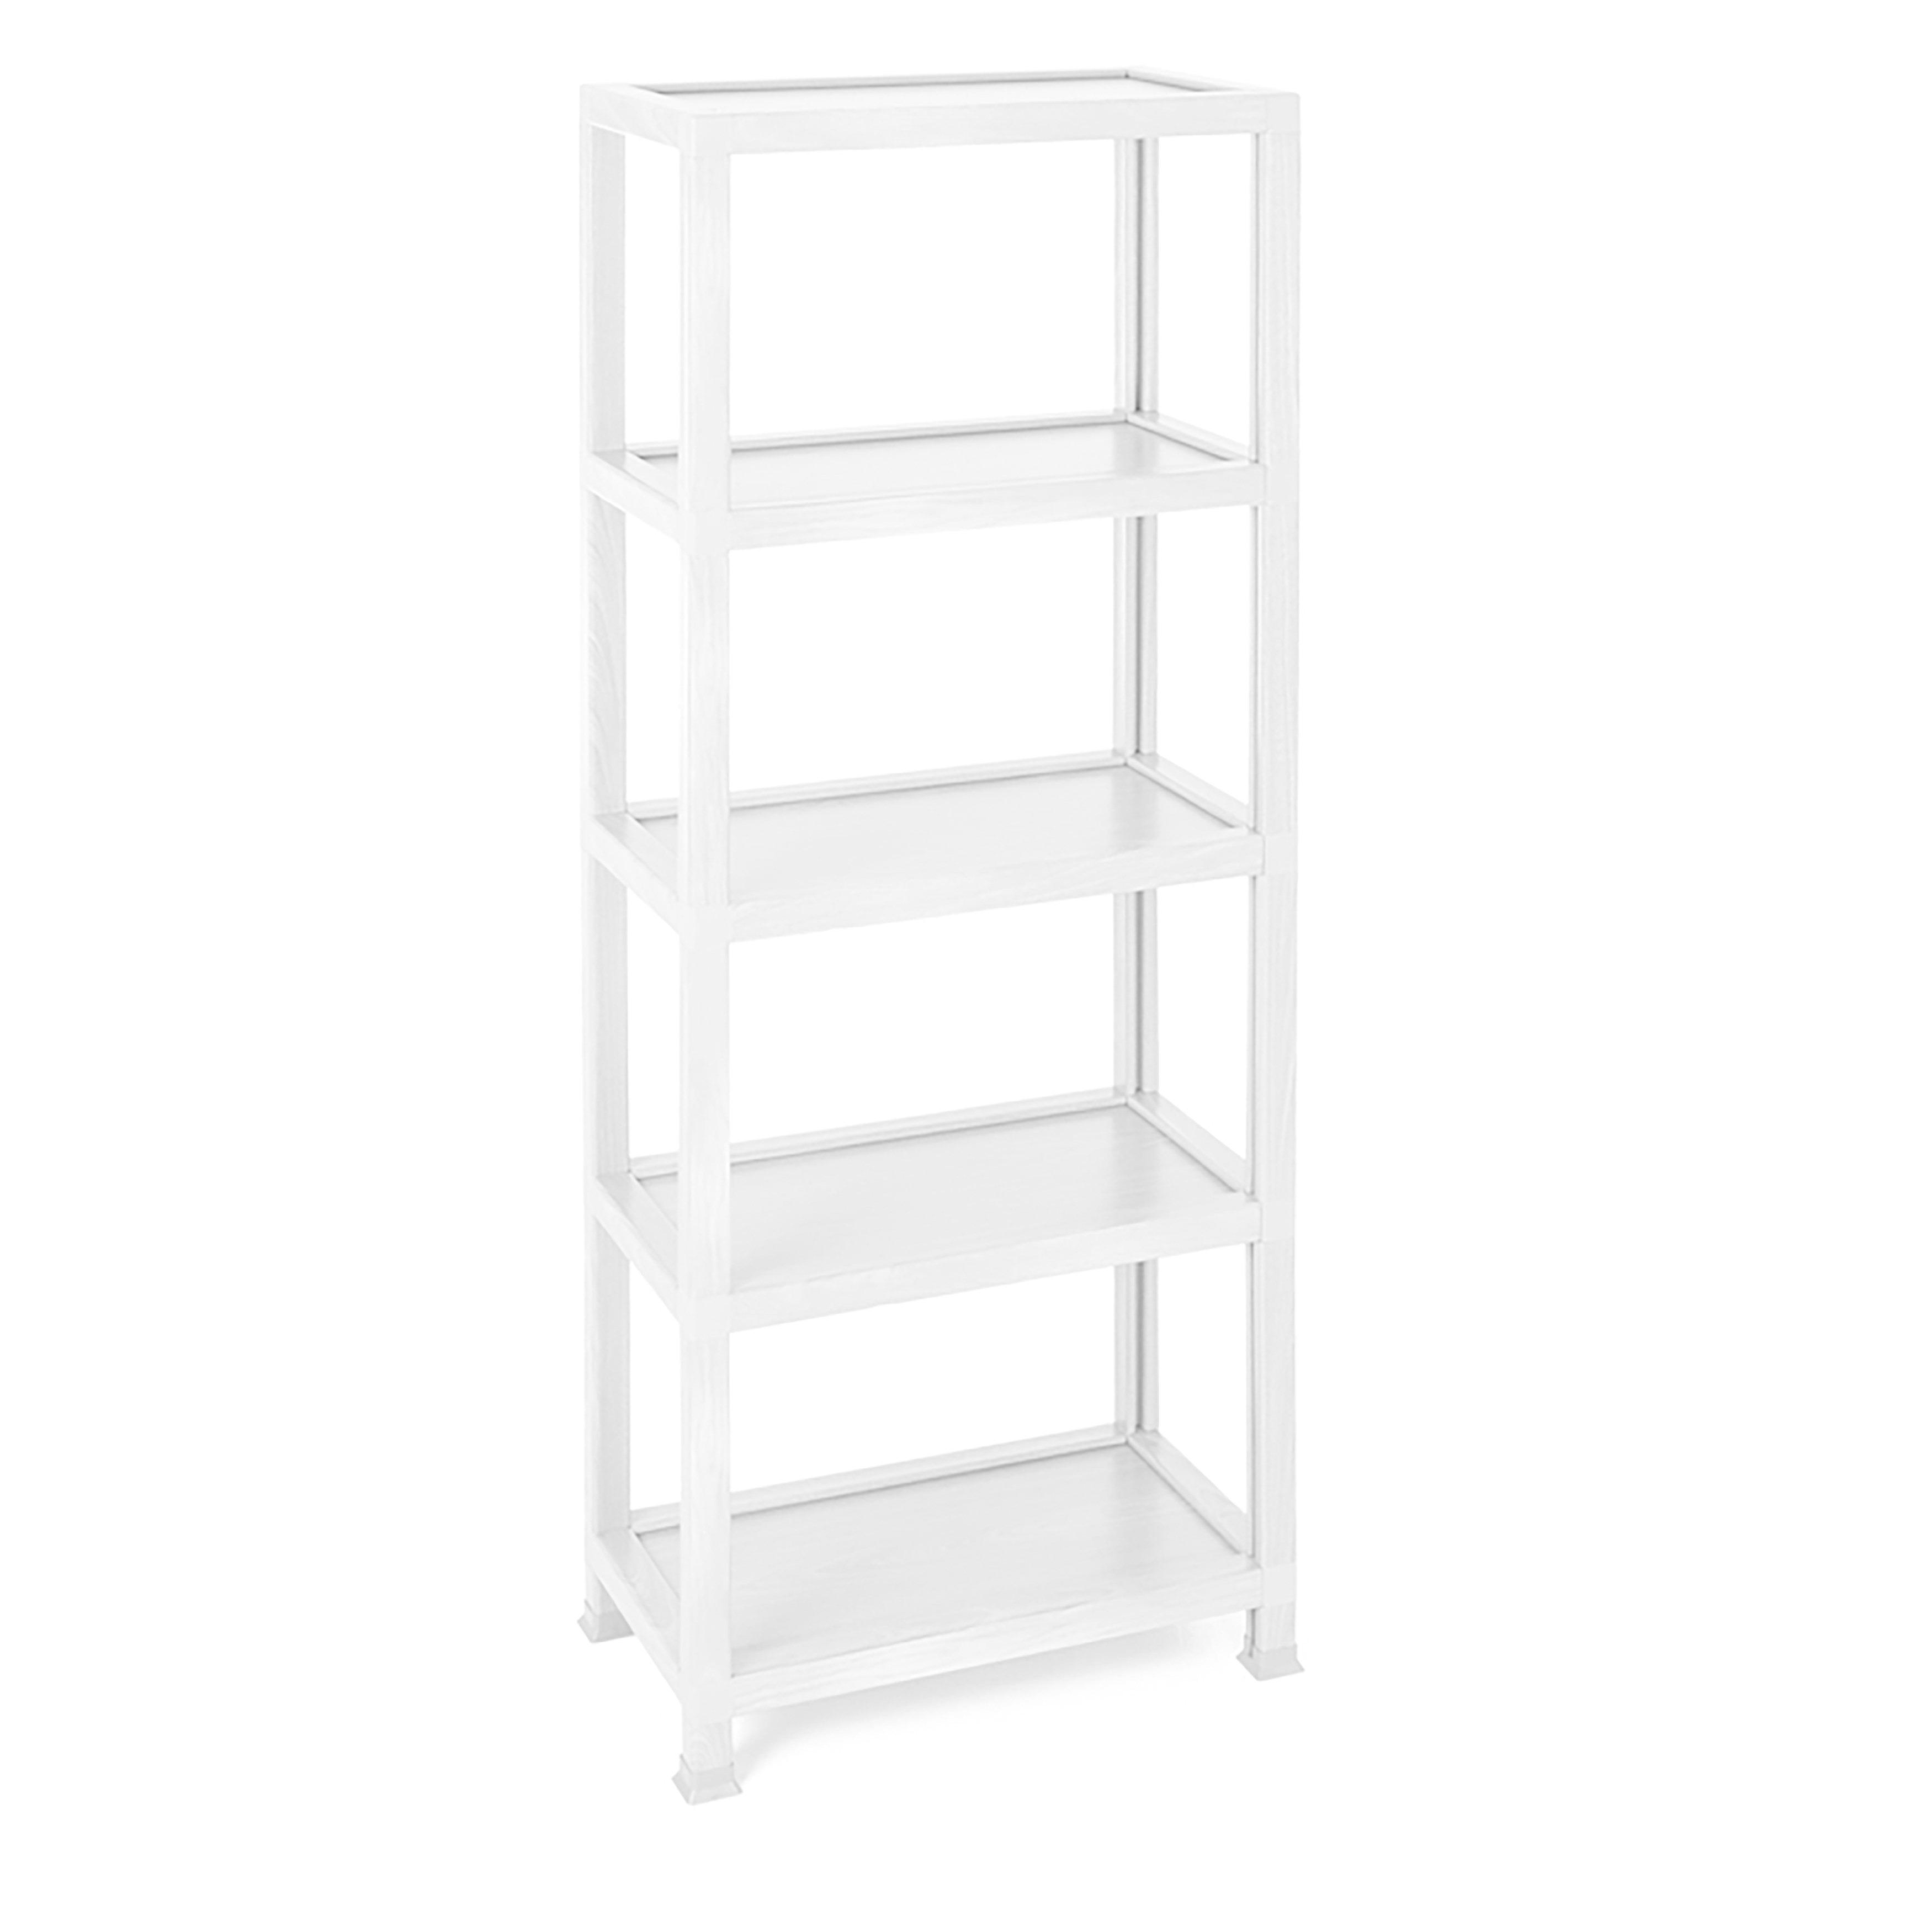 Kensington 5 Tier Eco Friendly Storage Shelf And Bookcase N Toxic Zboard Paperboard